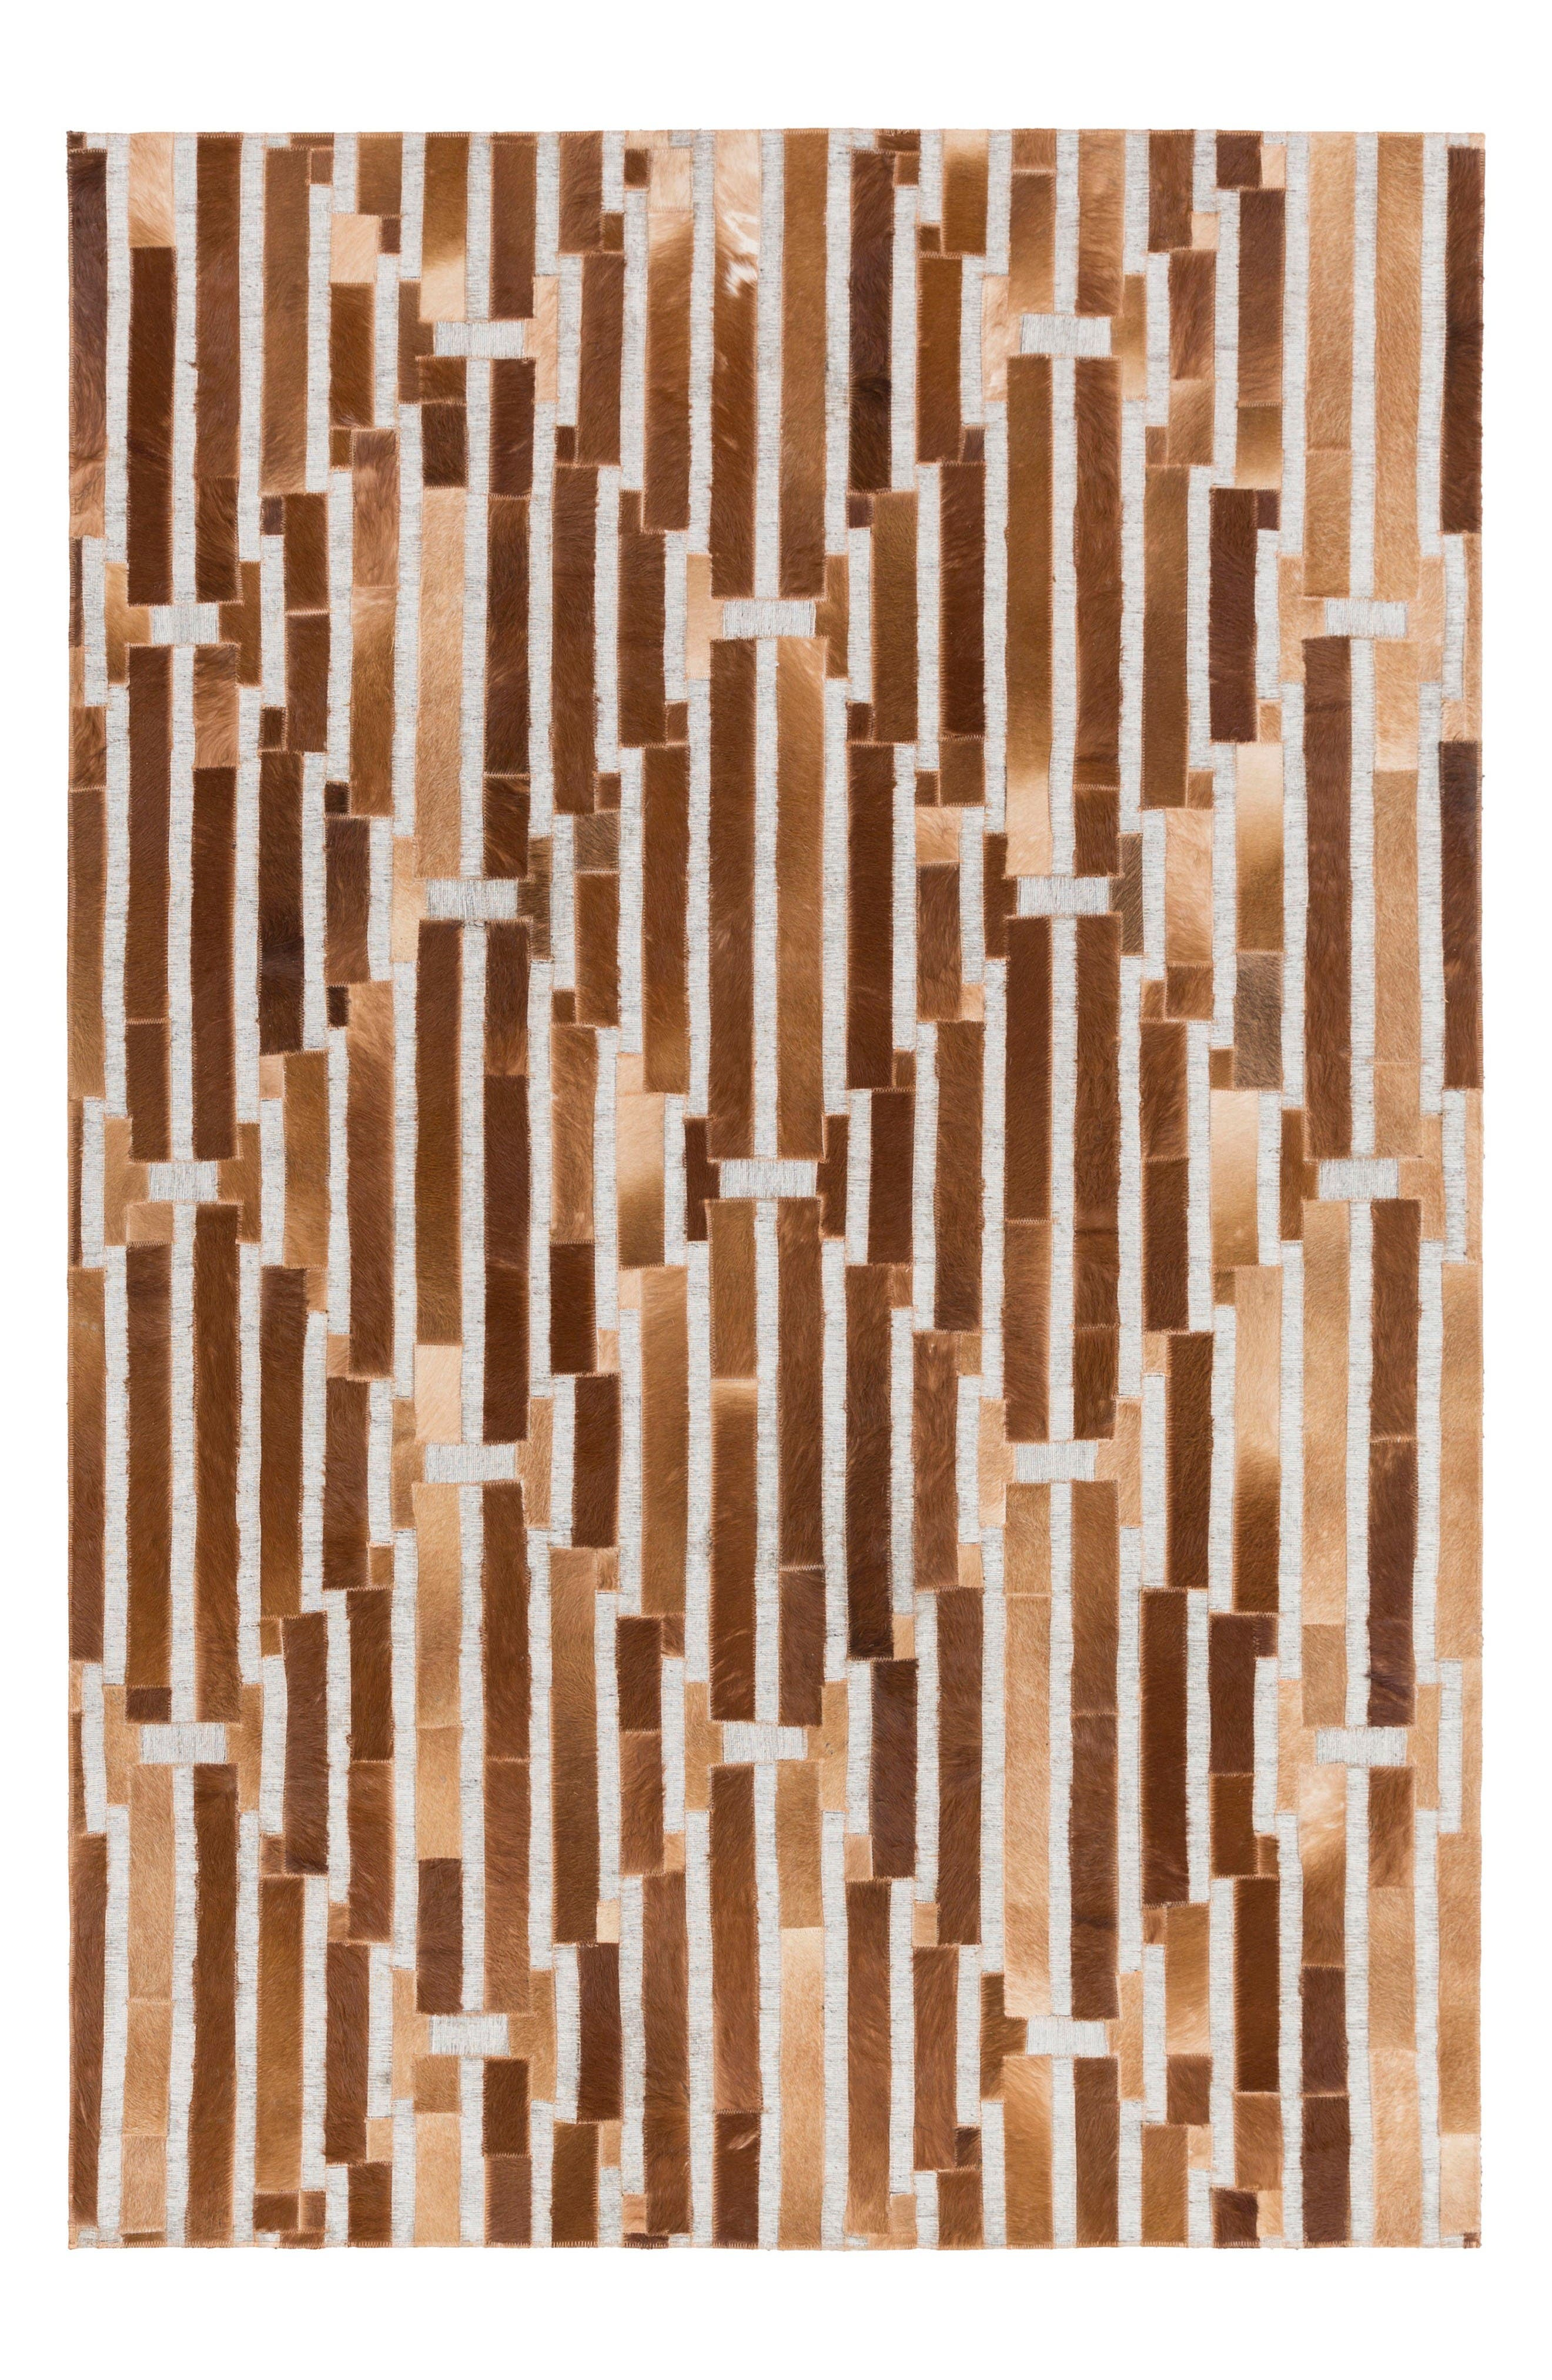 Alternate Image 1 Selected - Surya Home Medora Irregular Hand Stitched Rug